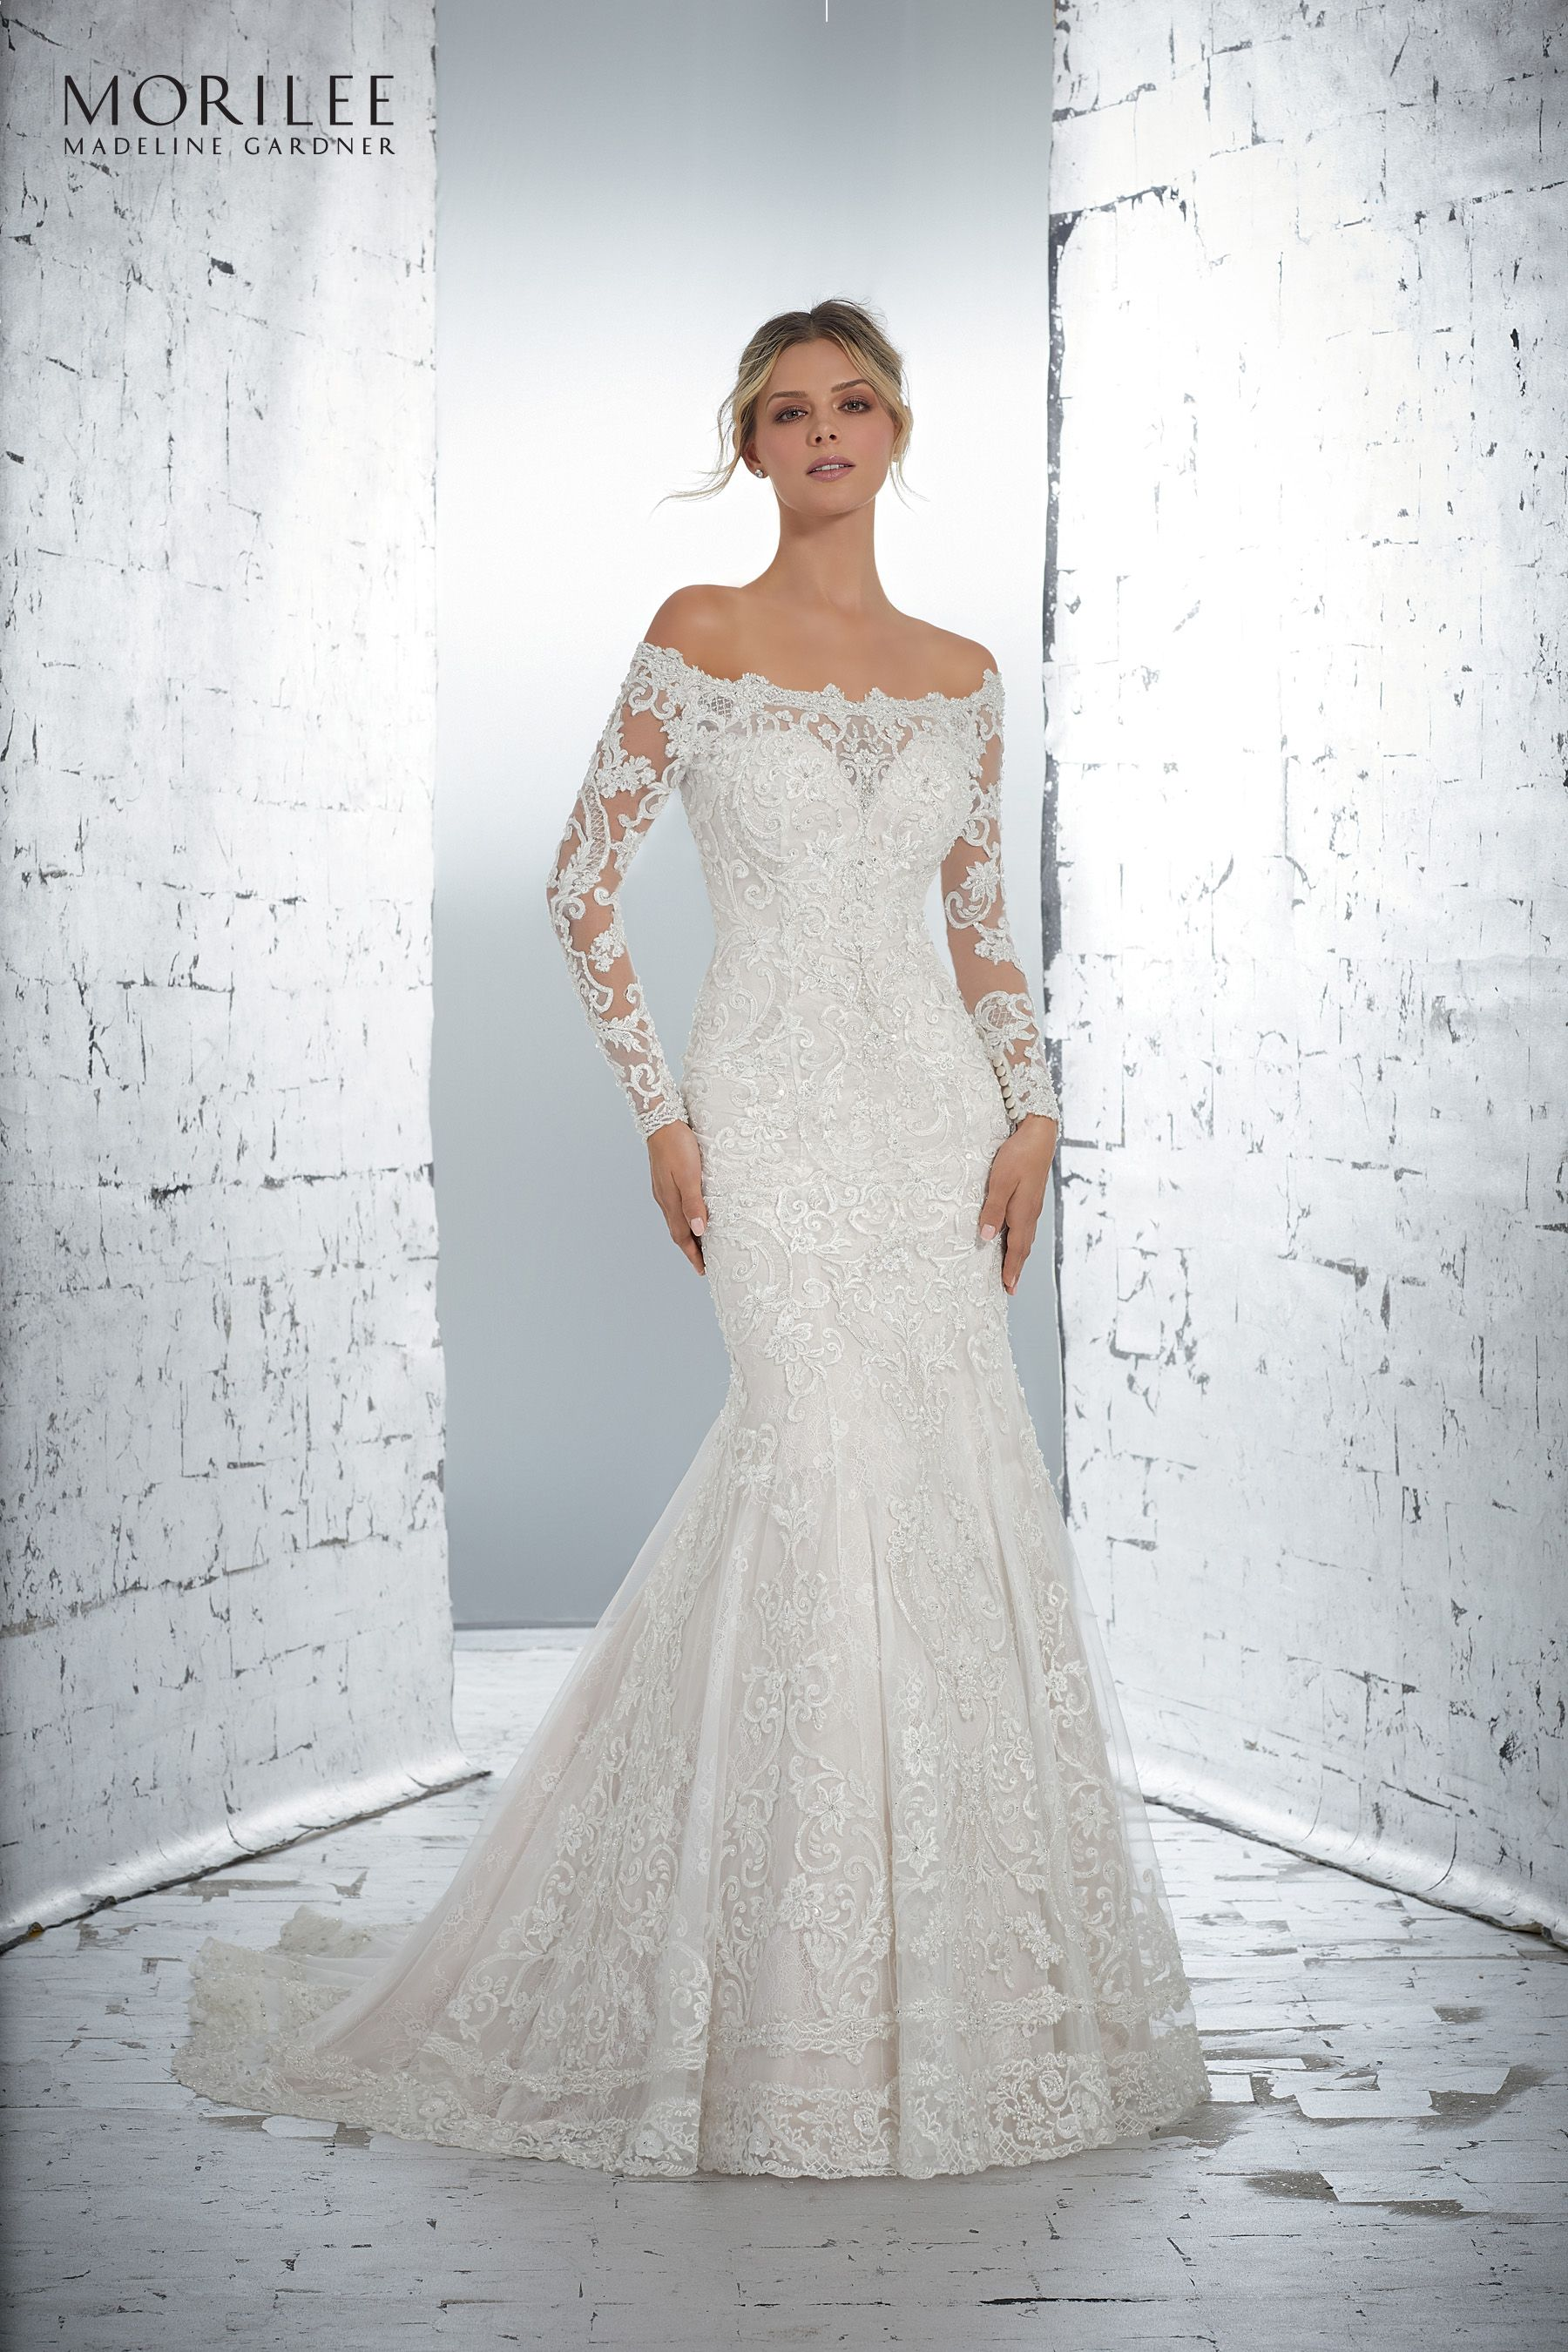 Morilee uk lysandra wedding dress style classic long sleeve